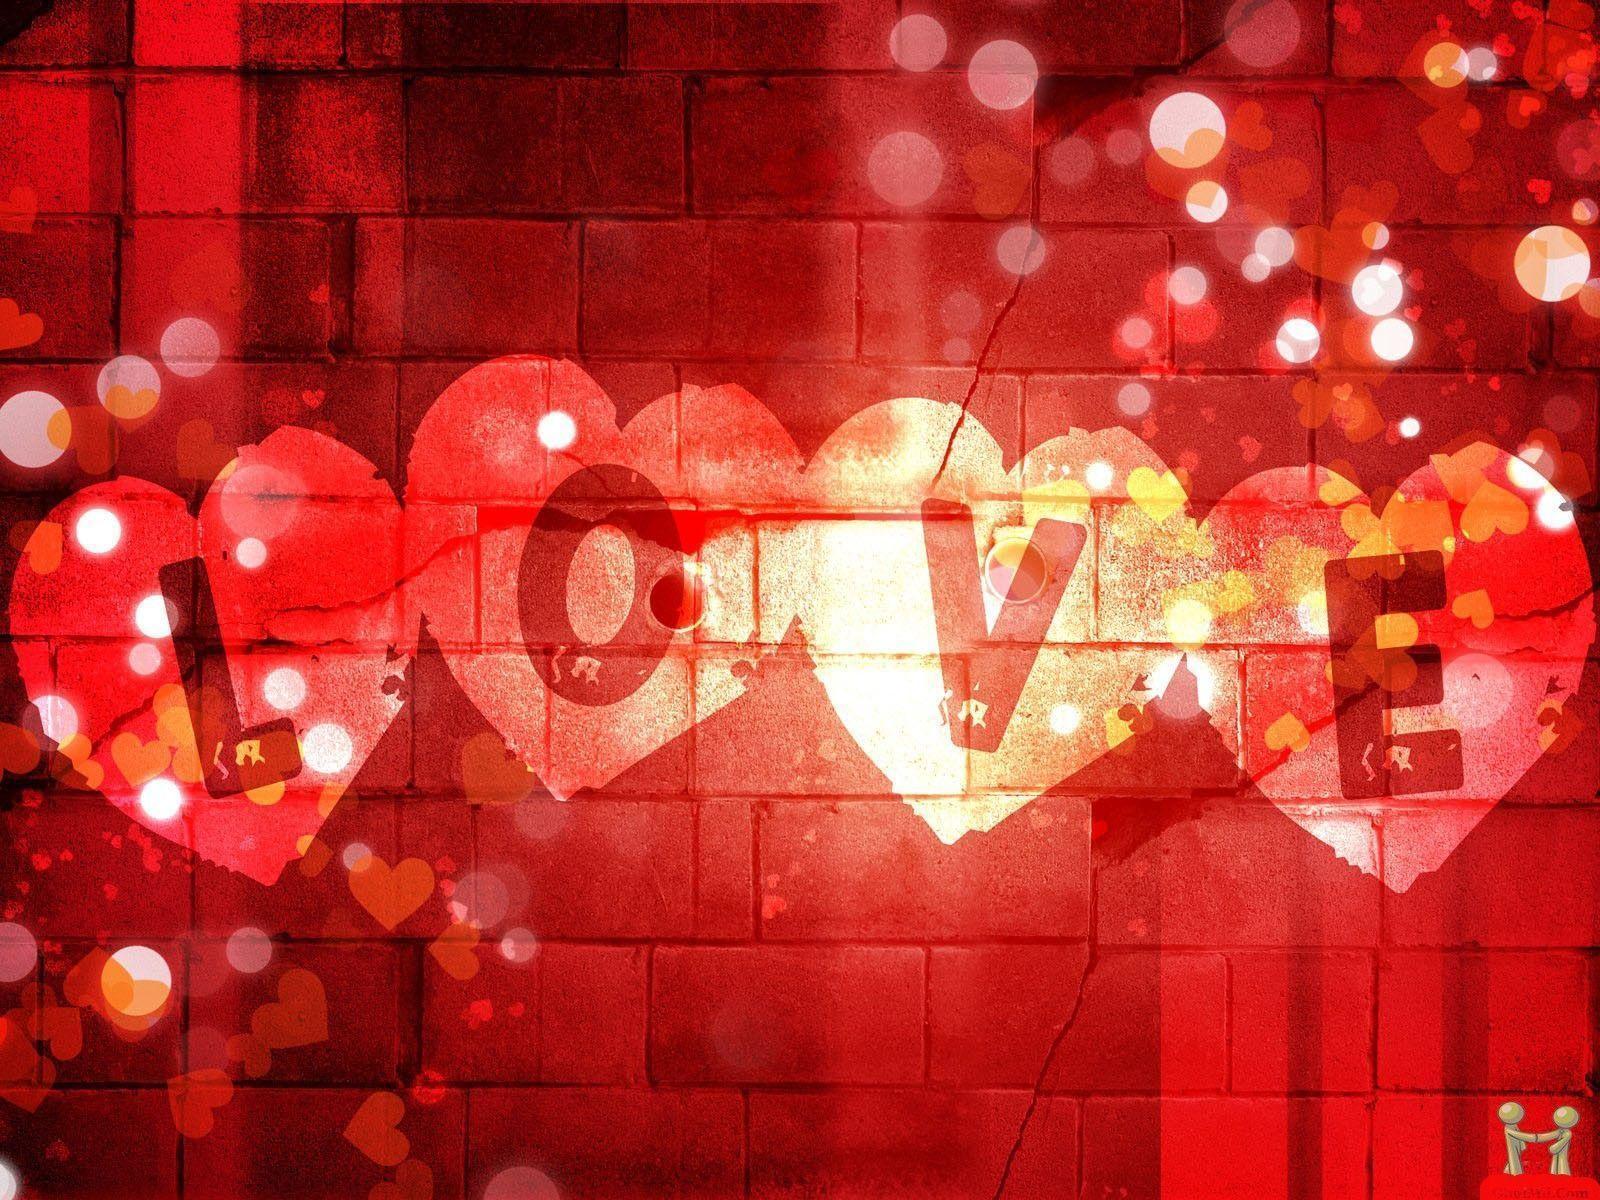 Love Wallpaper cave : 3D Love Wallpapers - Wallpaper cave